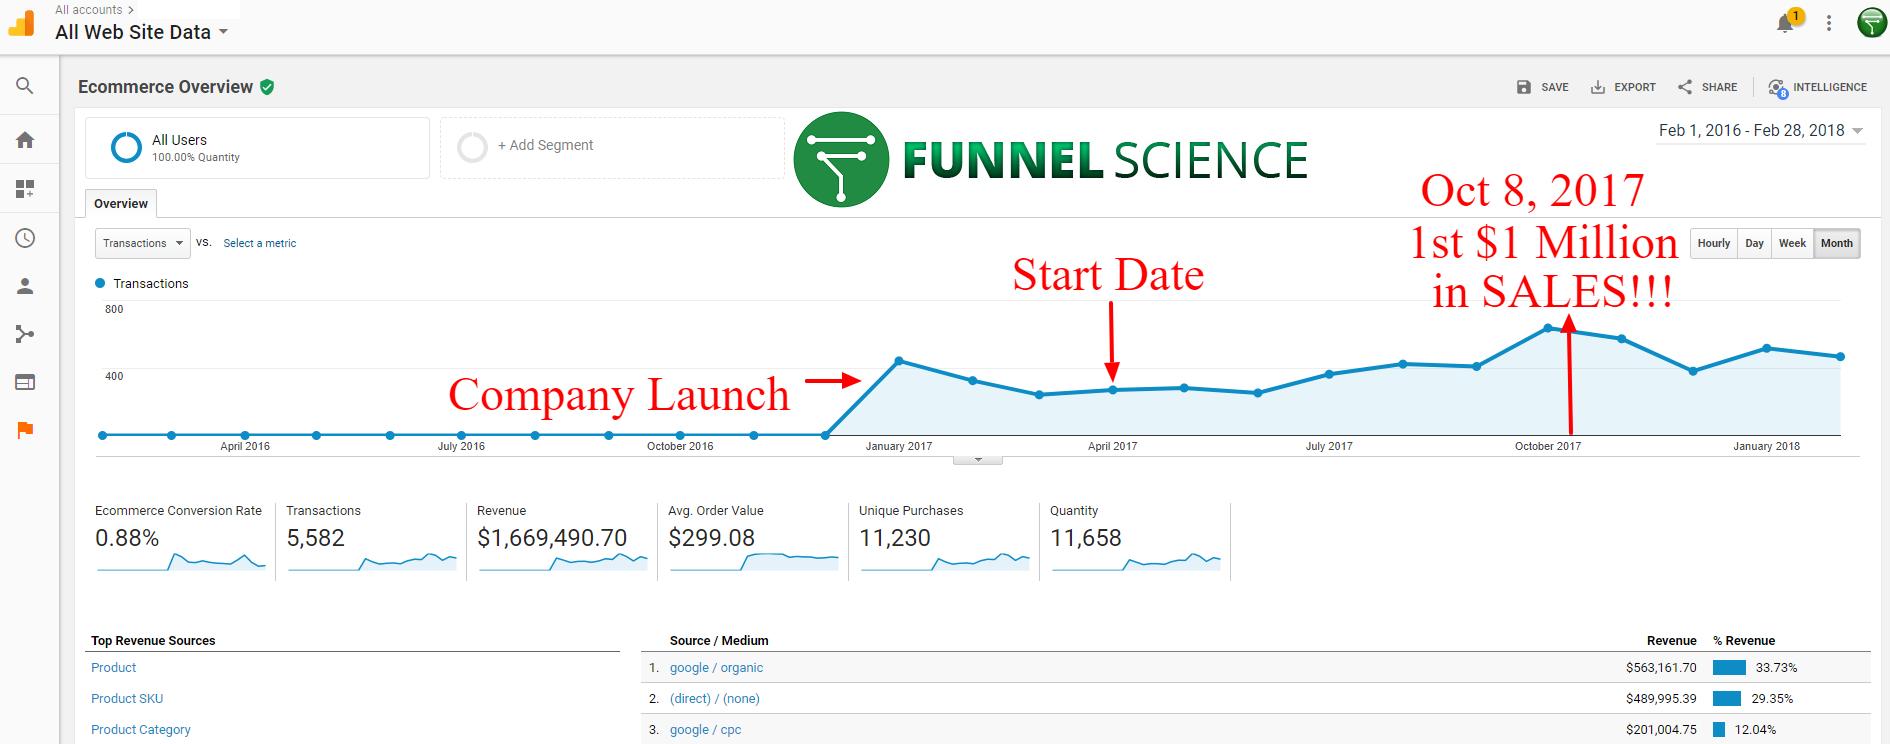 Funnel Science Internet Marketing using Scientific Method